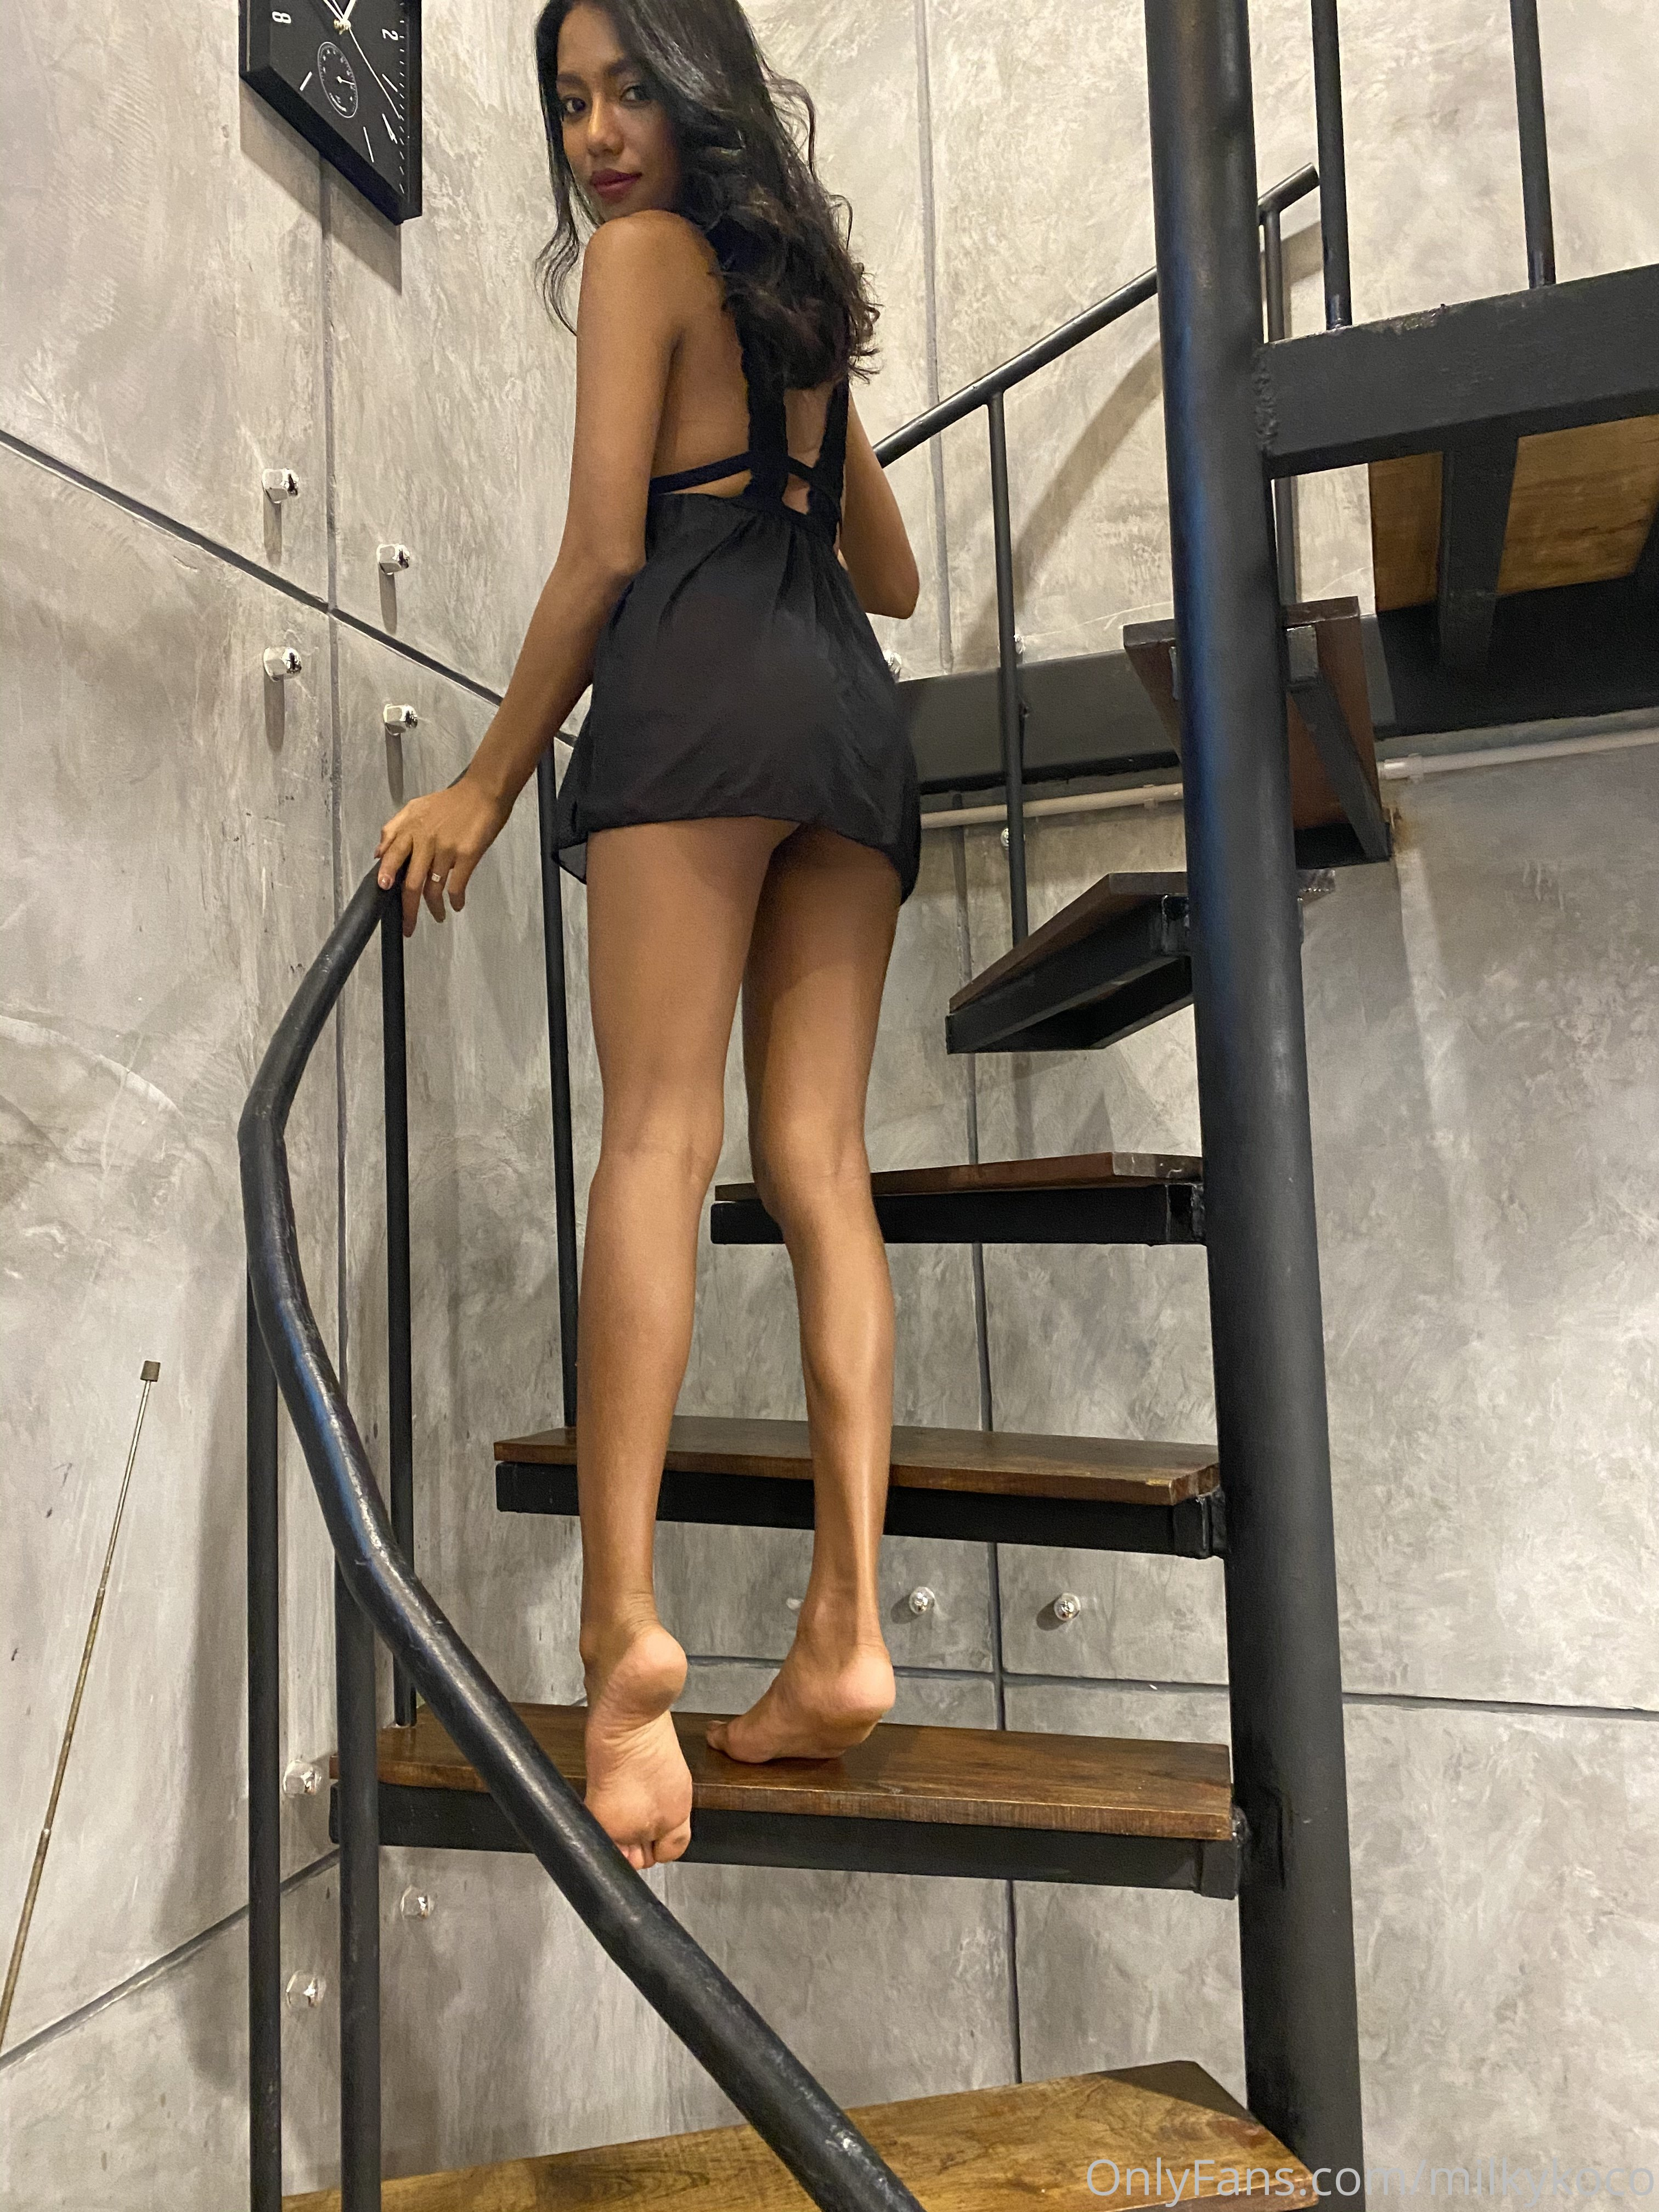 Koko Mylk Bangkok Model Leaked Onlyfans 0079